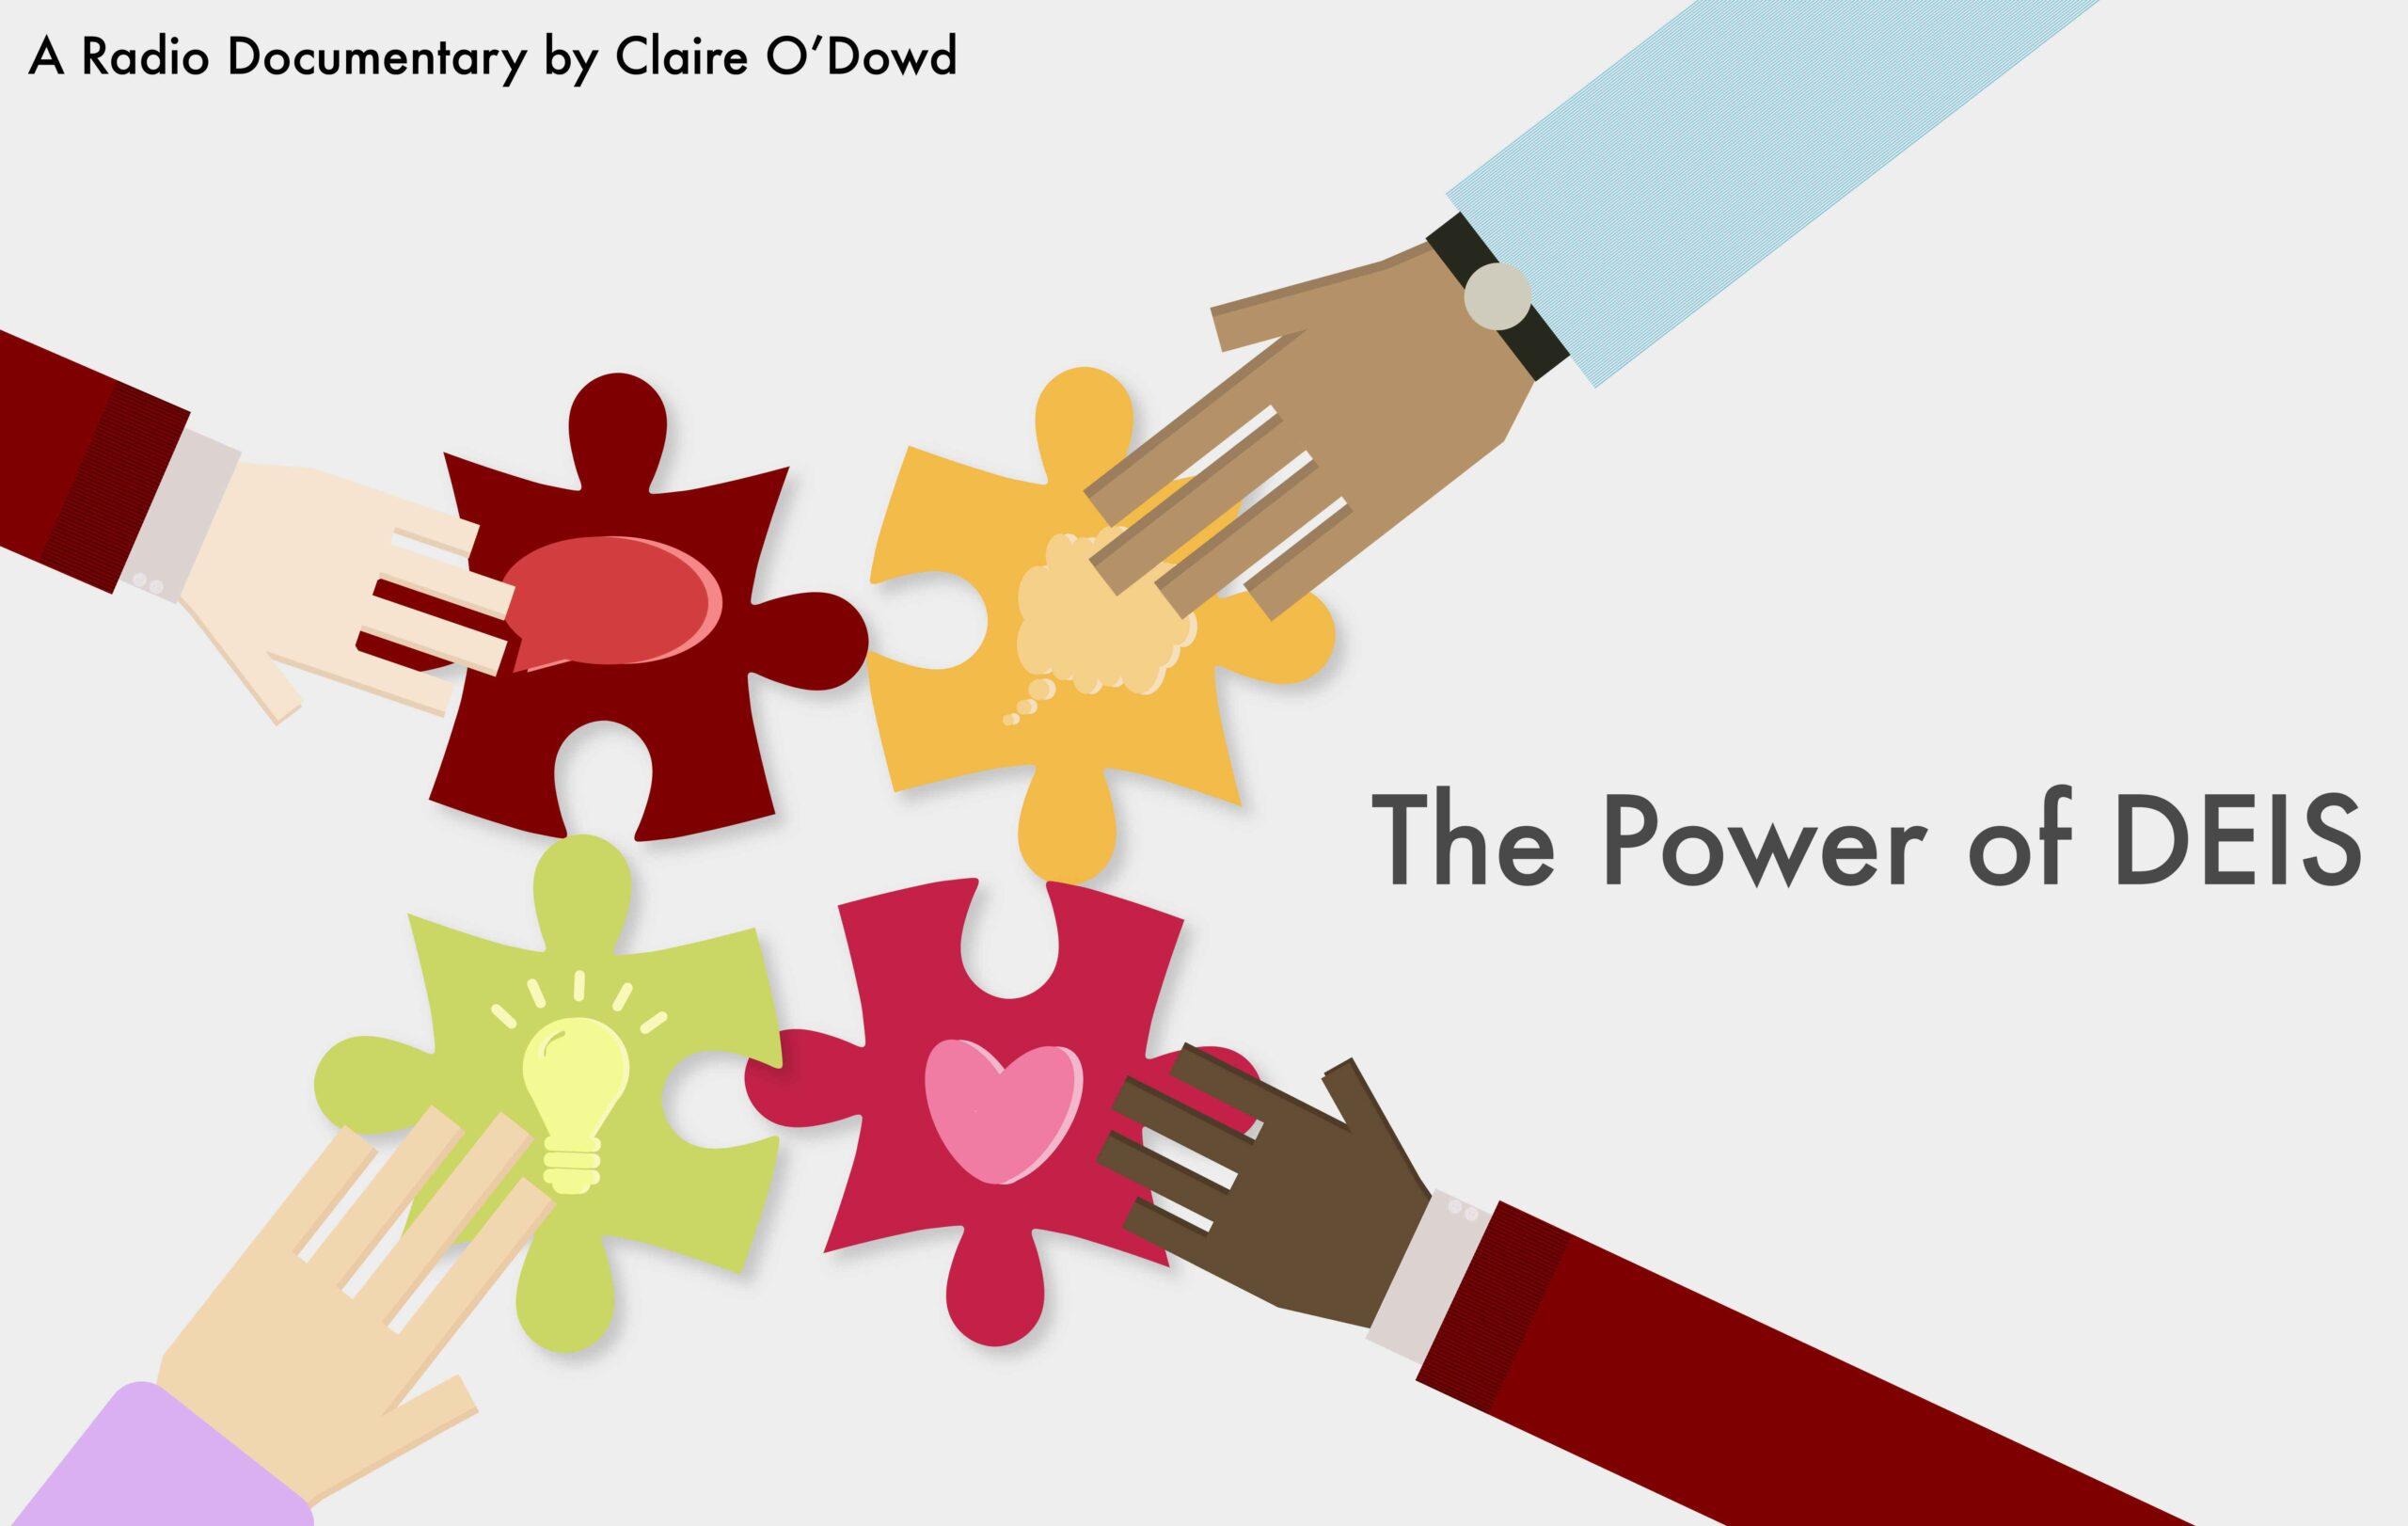 The Power of DEIS